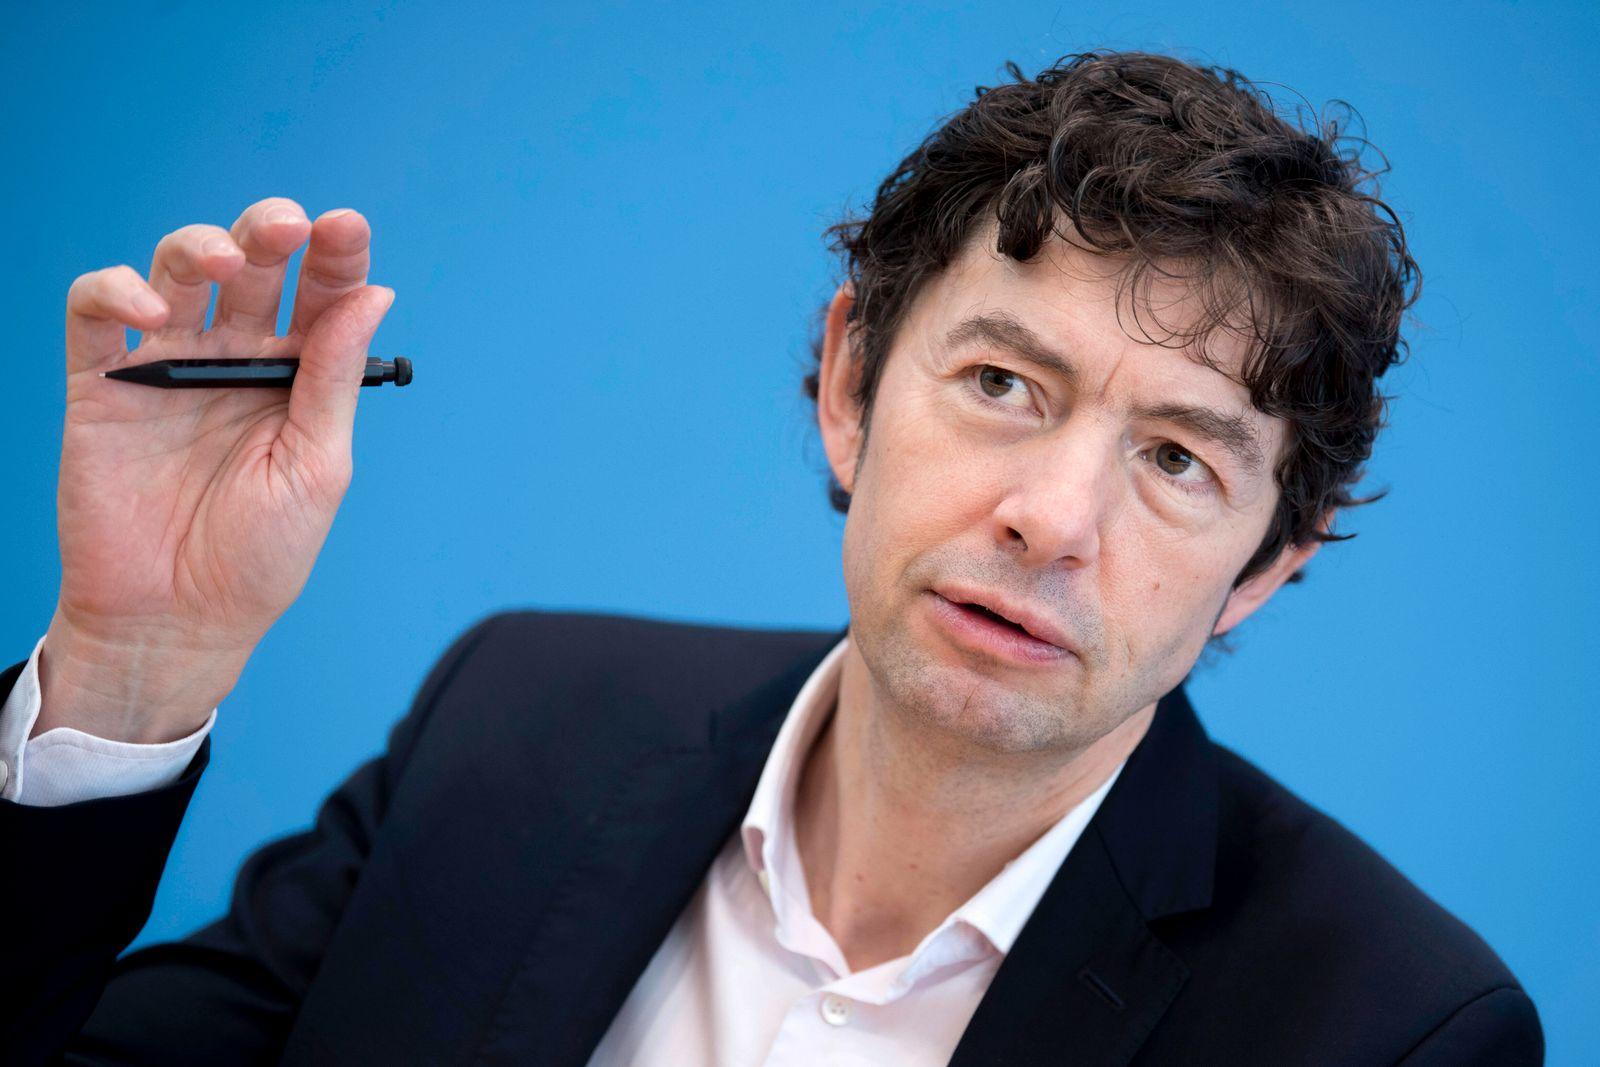 Prof. Christian Drosten, Coronavirus DEU, Deutschland, Germany, Berlin, 02.03.2020 Prof. Christian Drosten, Direktor In